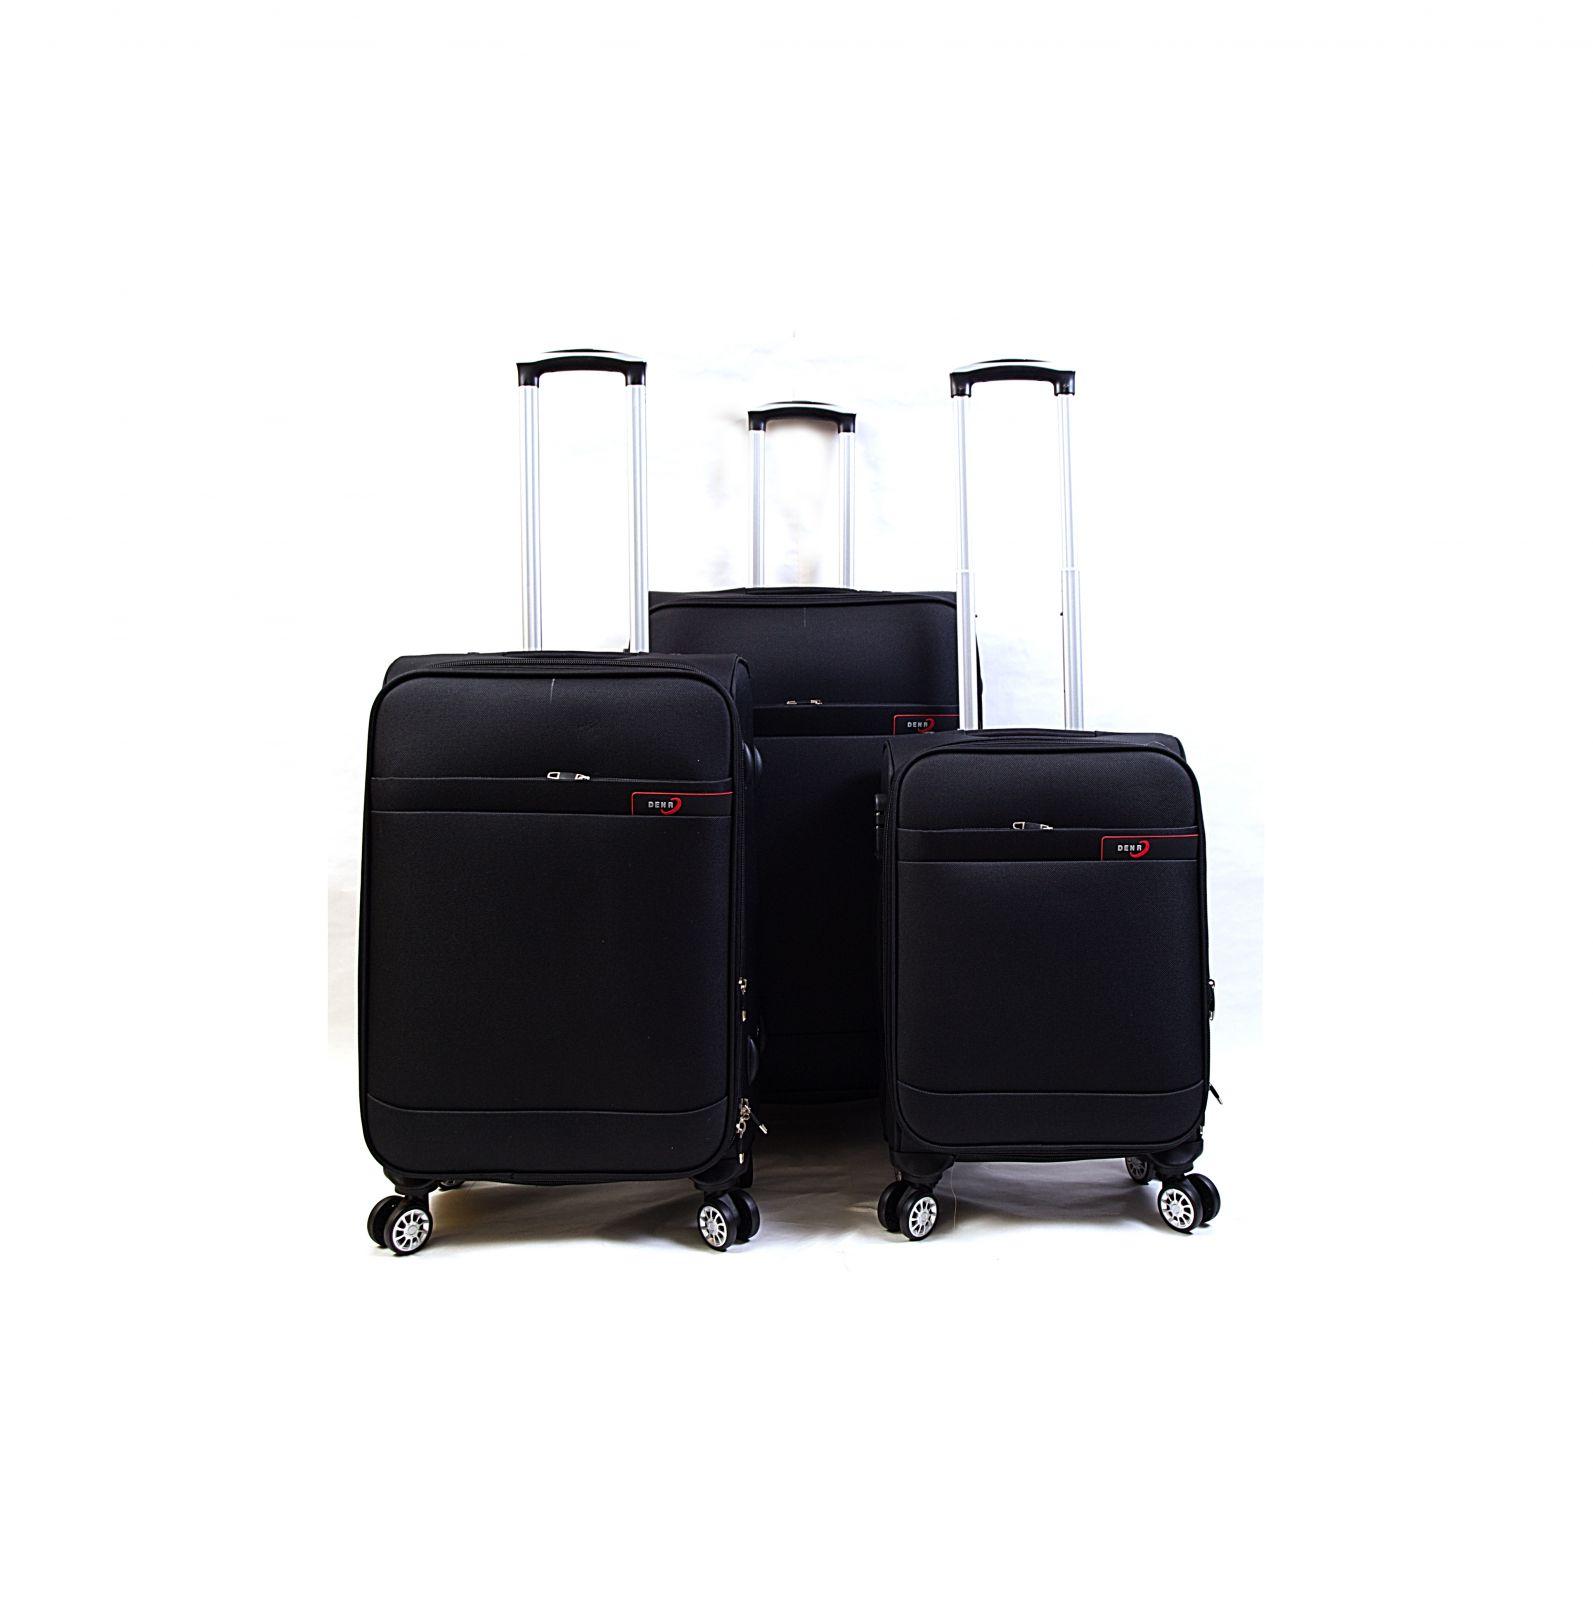 Trolley-CASE TC-882 4w sada 3 kufru černý E-batoh